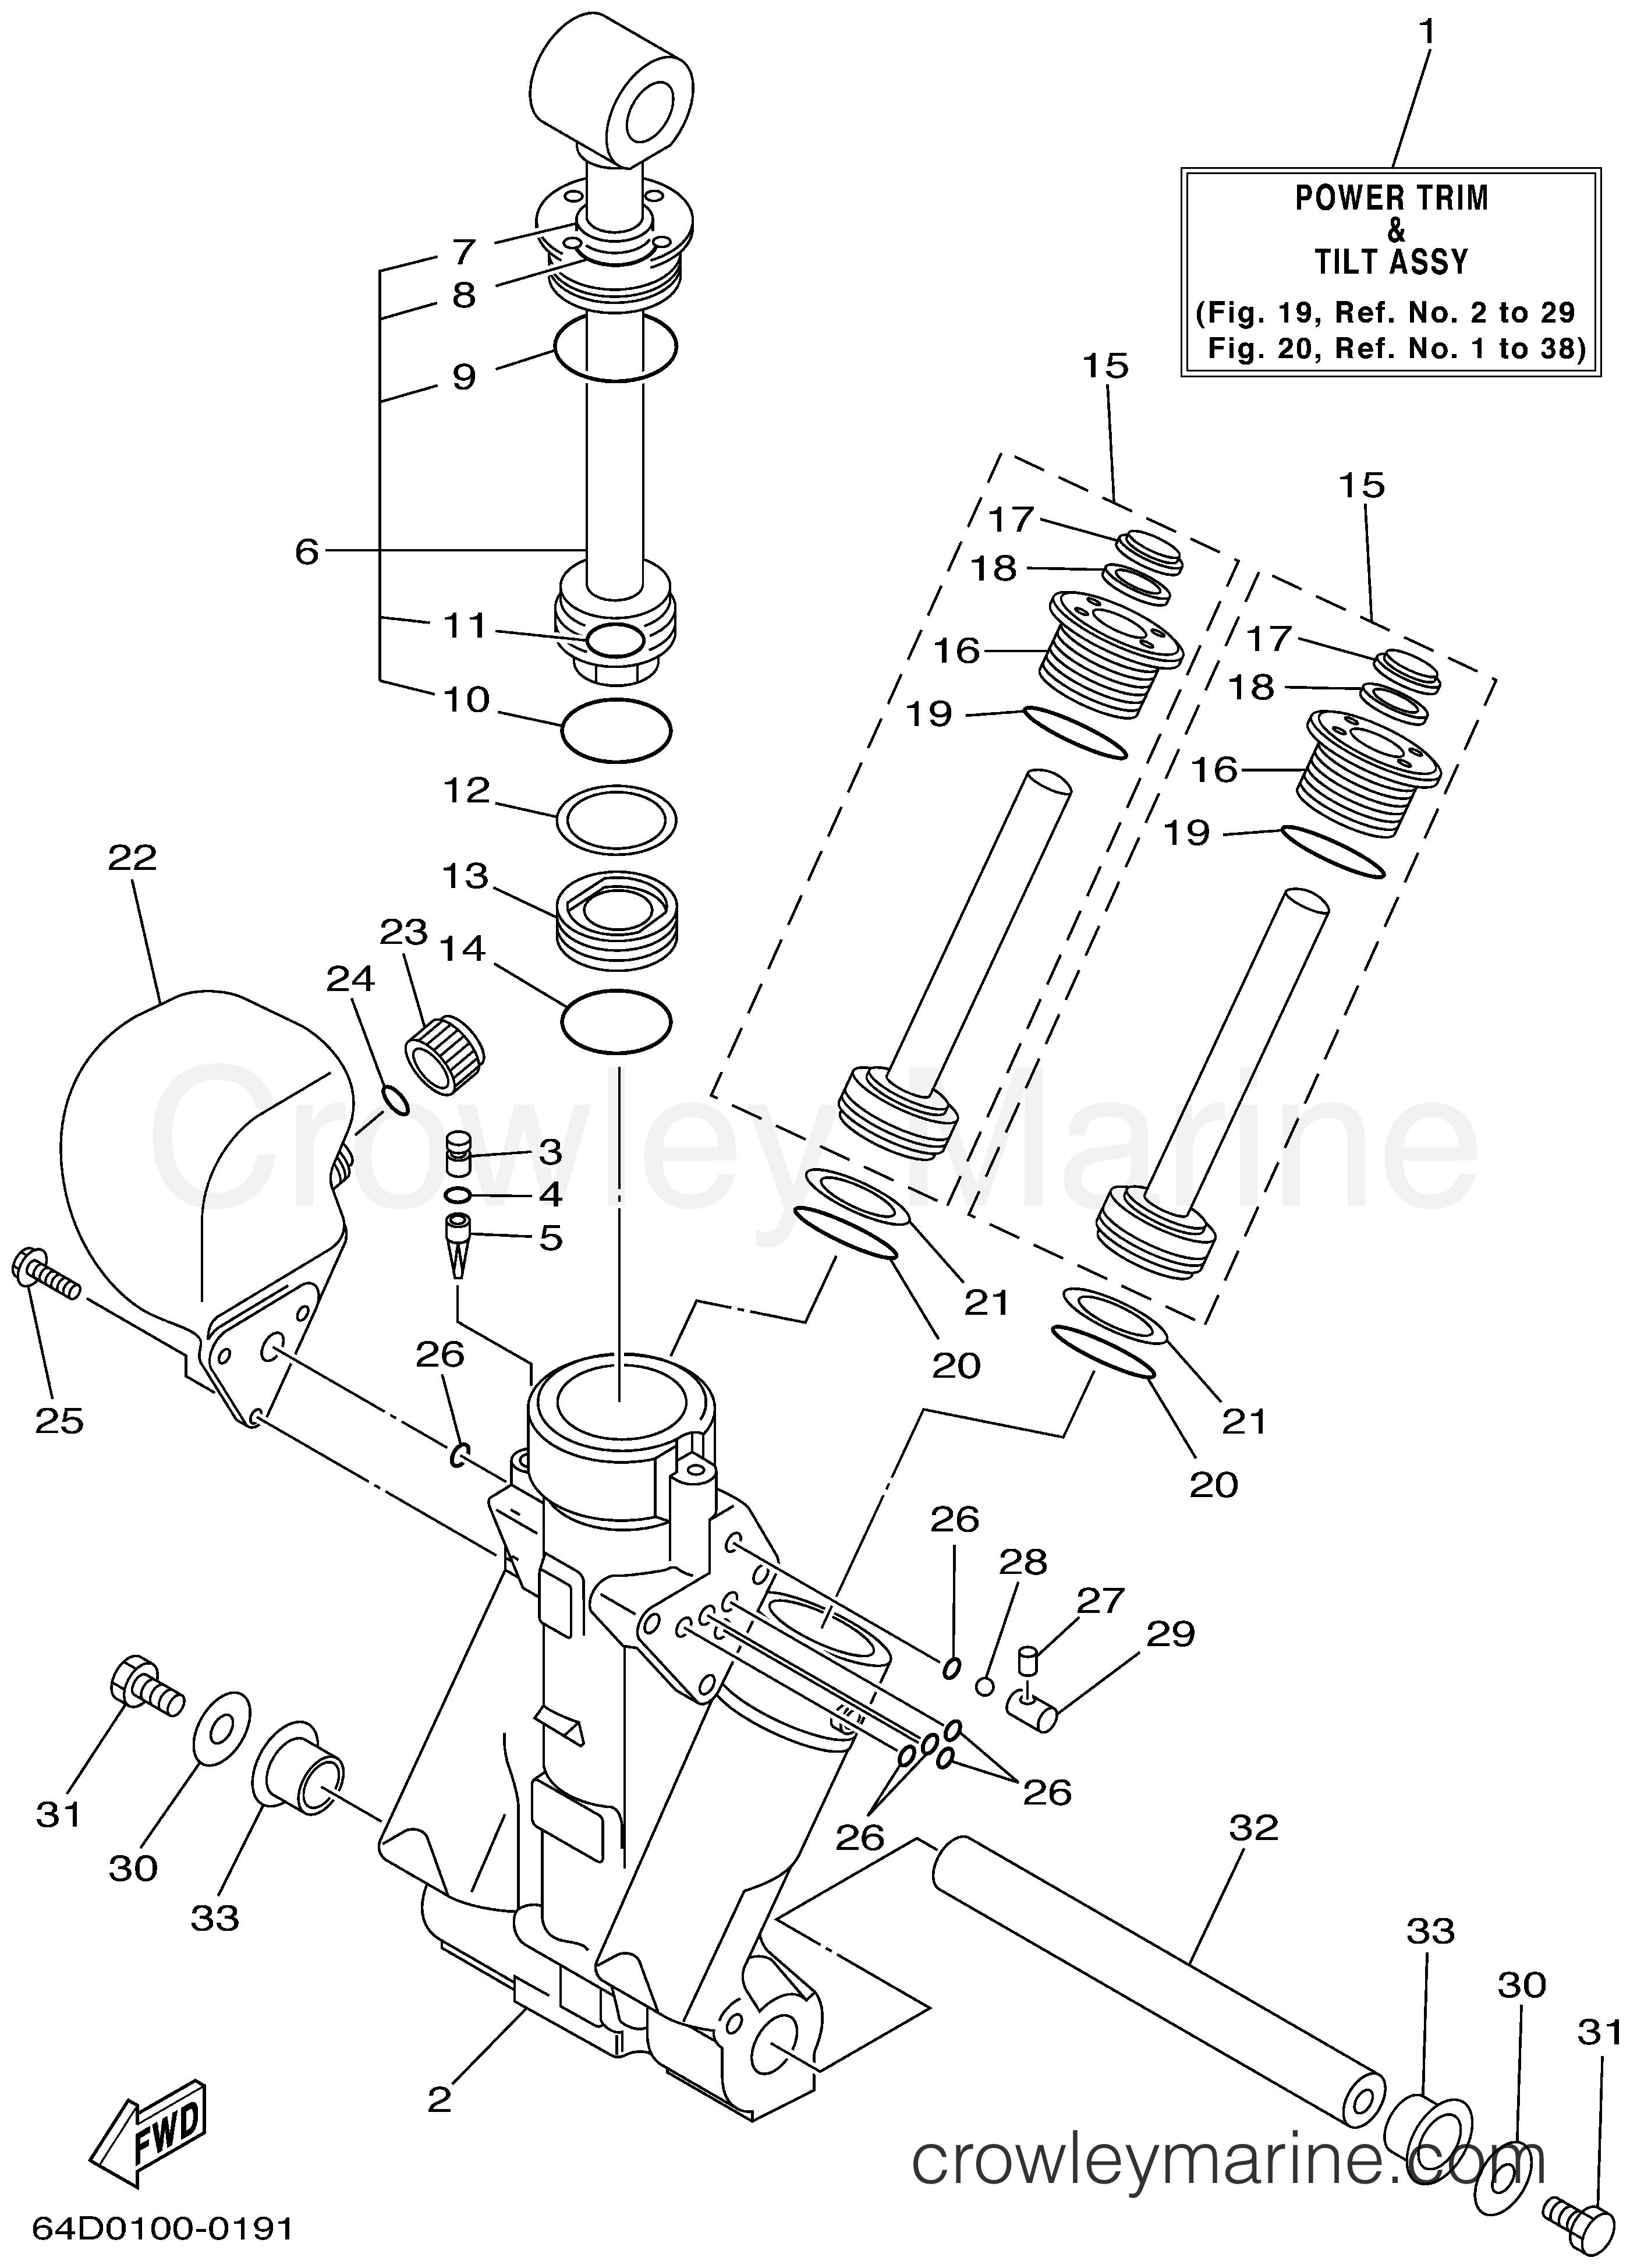 Yamaha Outboard Trim Diagram - Wiring Diagram